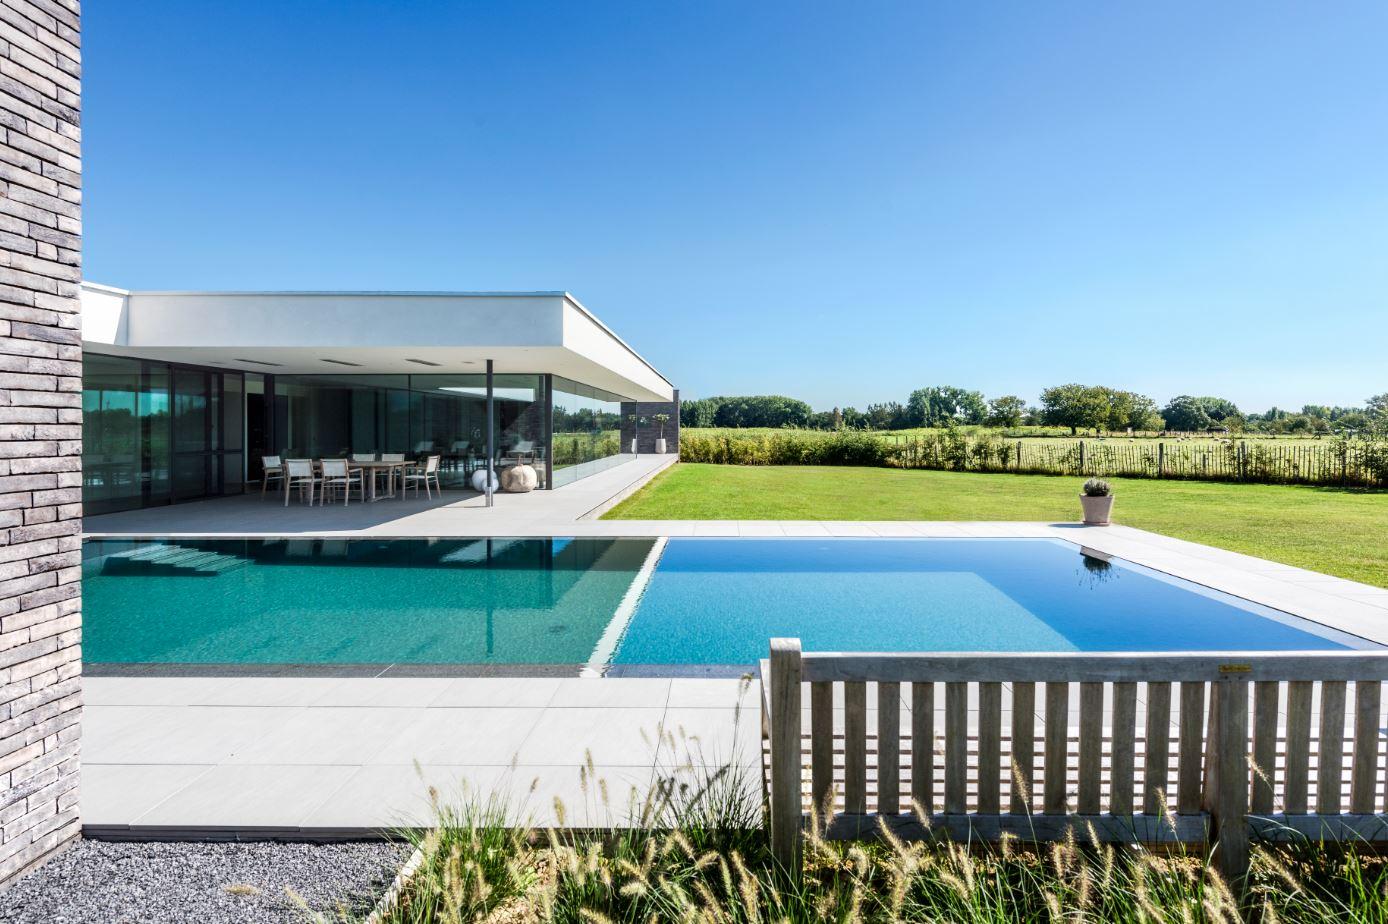 naessens zwembaden willy naessens swimming pools zwembad bouwers